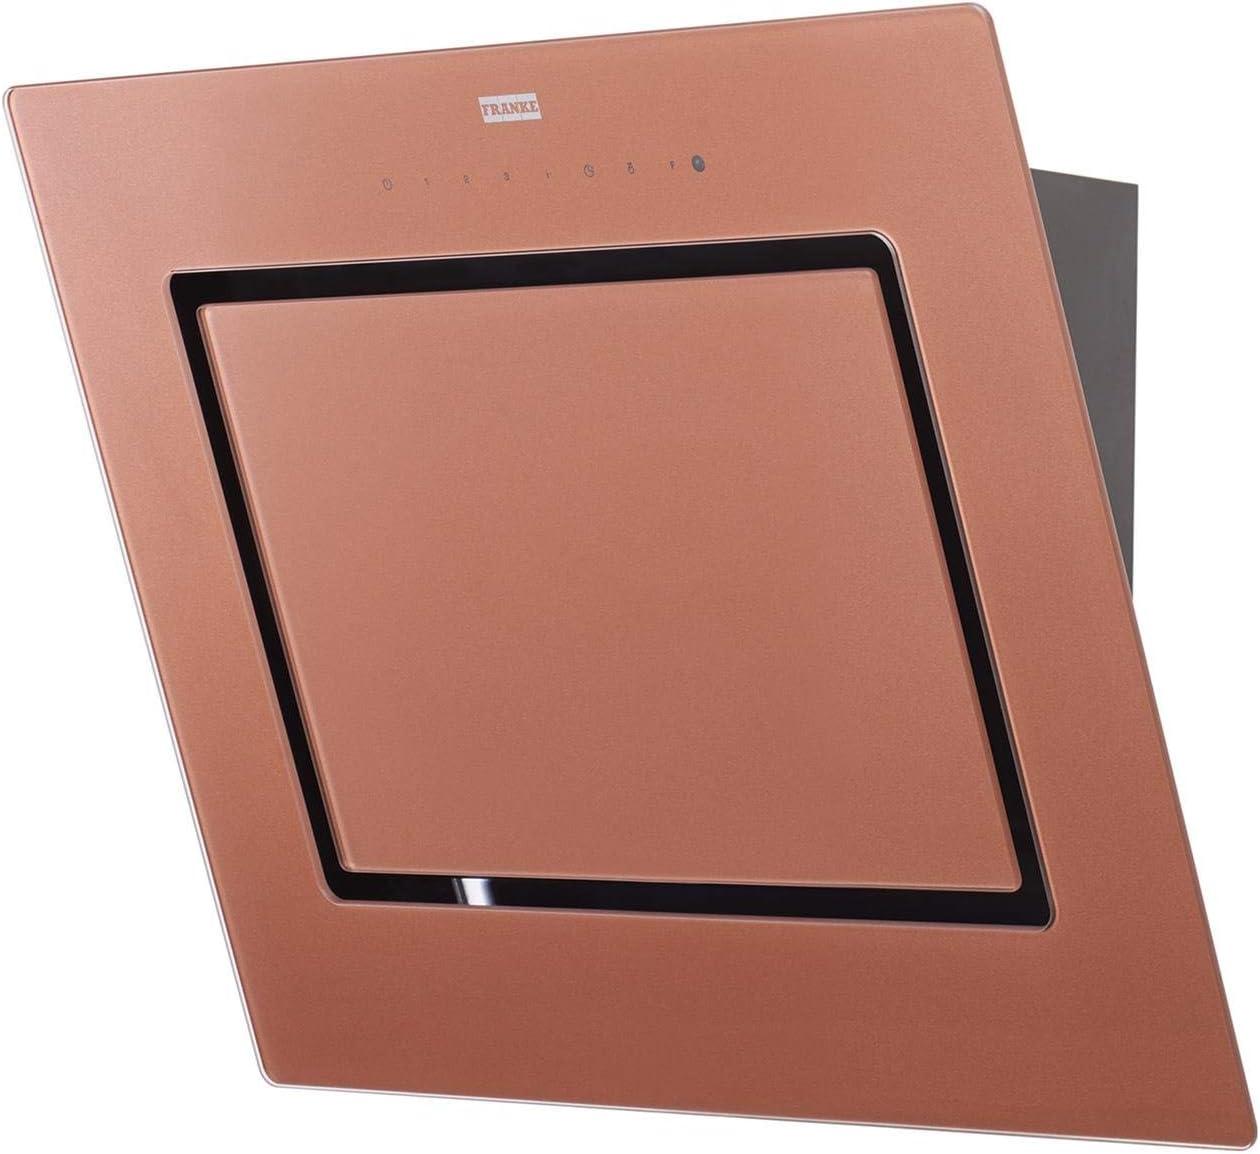 Franke Mythos FMY 606 CO - Campana extractora de pared (cobre): Amazon.es: Grandes electrodomésticos